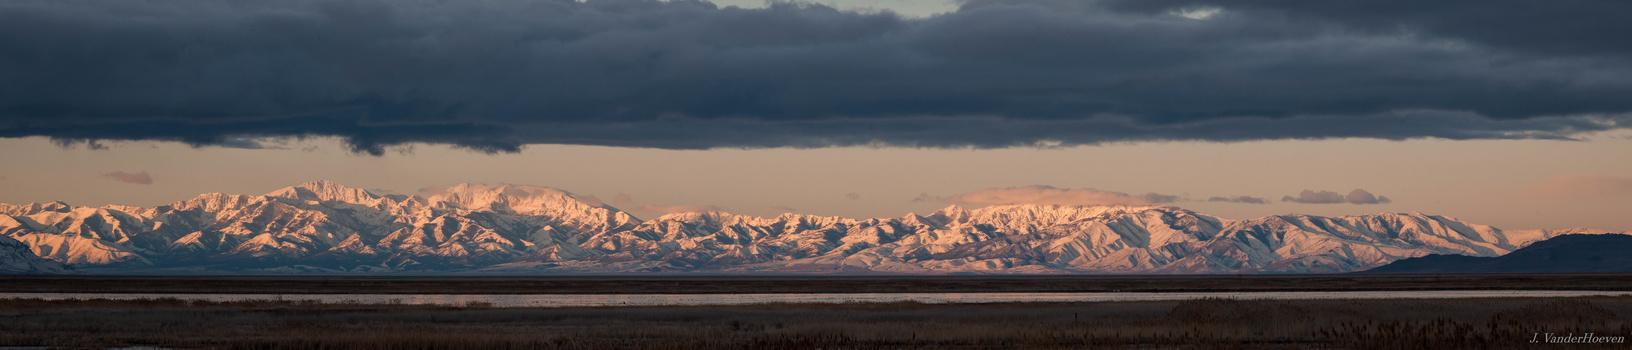 Morning Panorama by Jake VanderHoeven